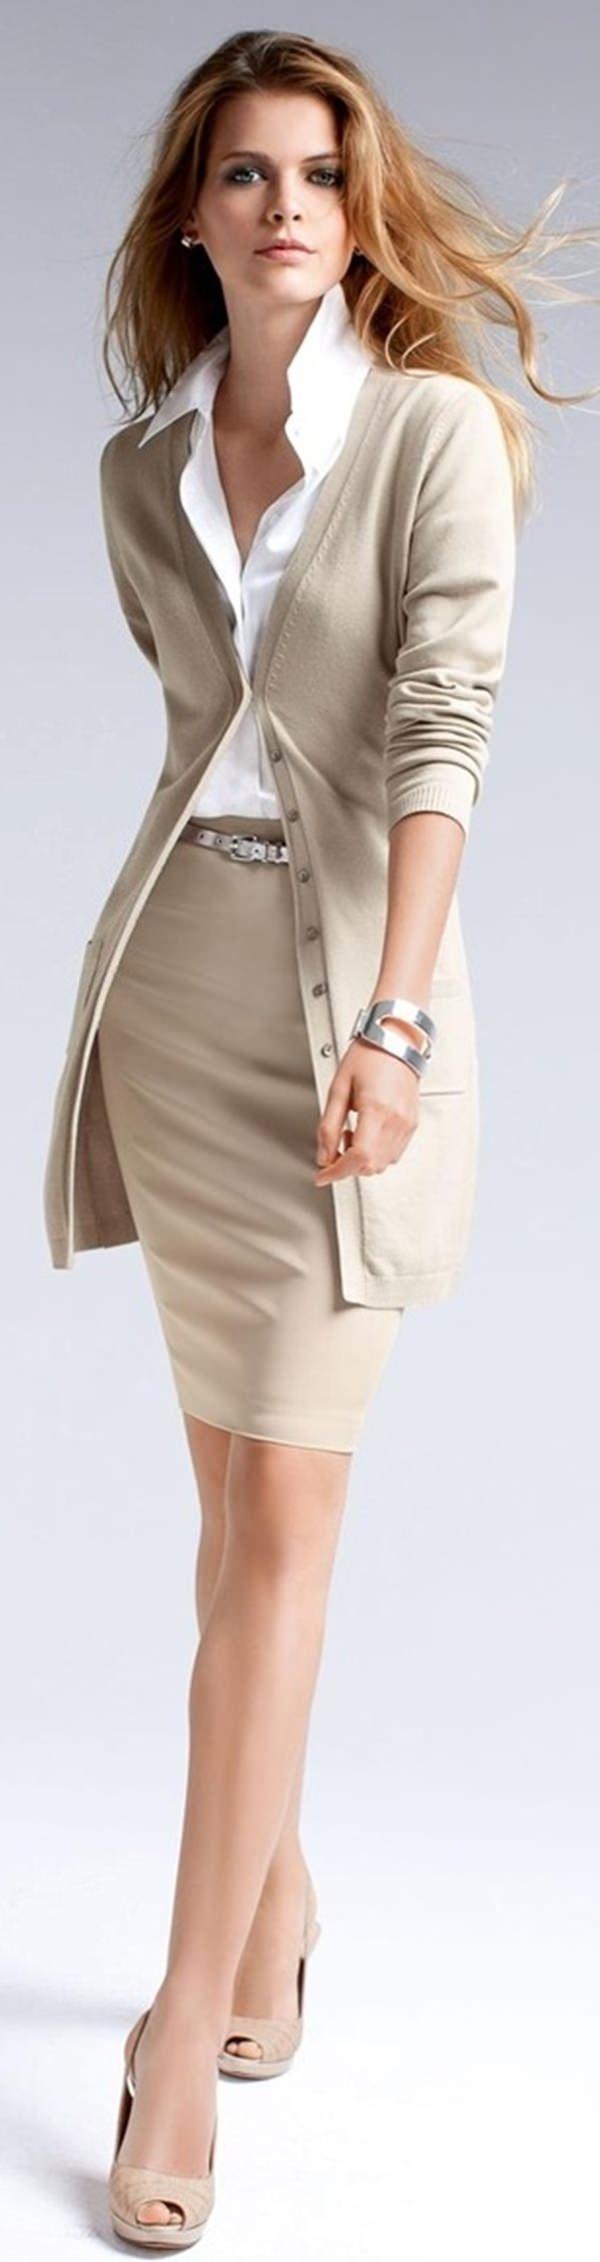 trajes de falda lápiz 33